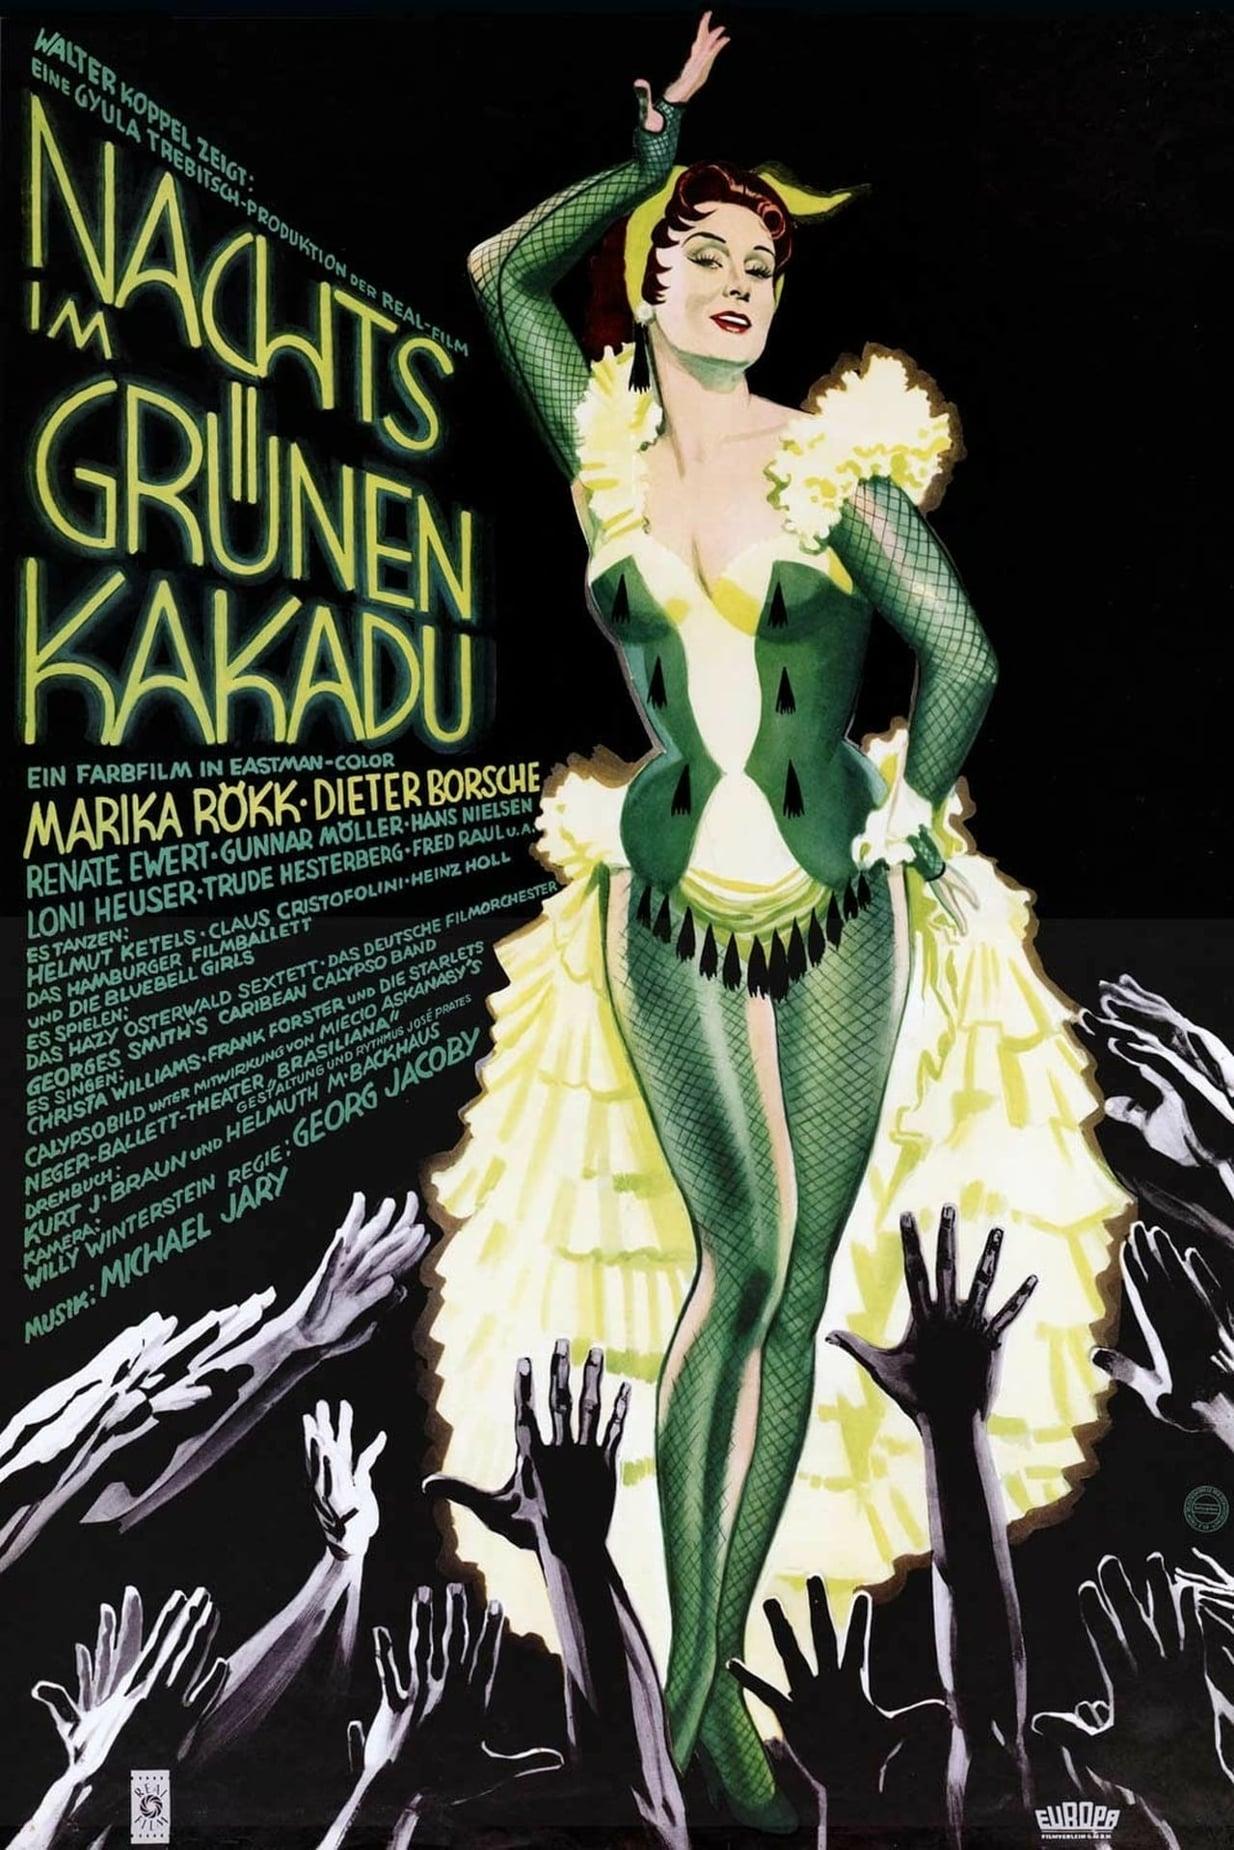 Nachts im Grünen Kakadu